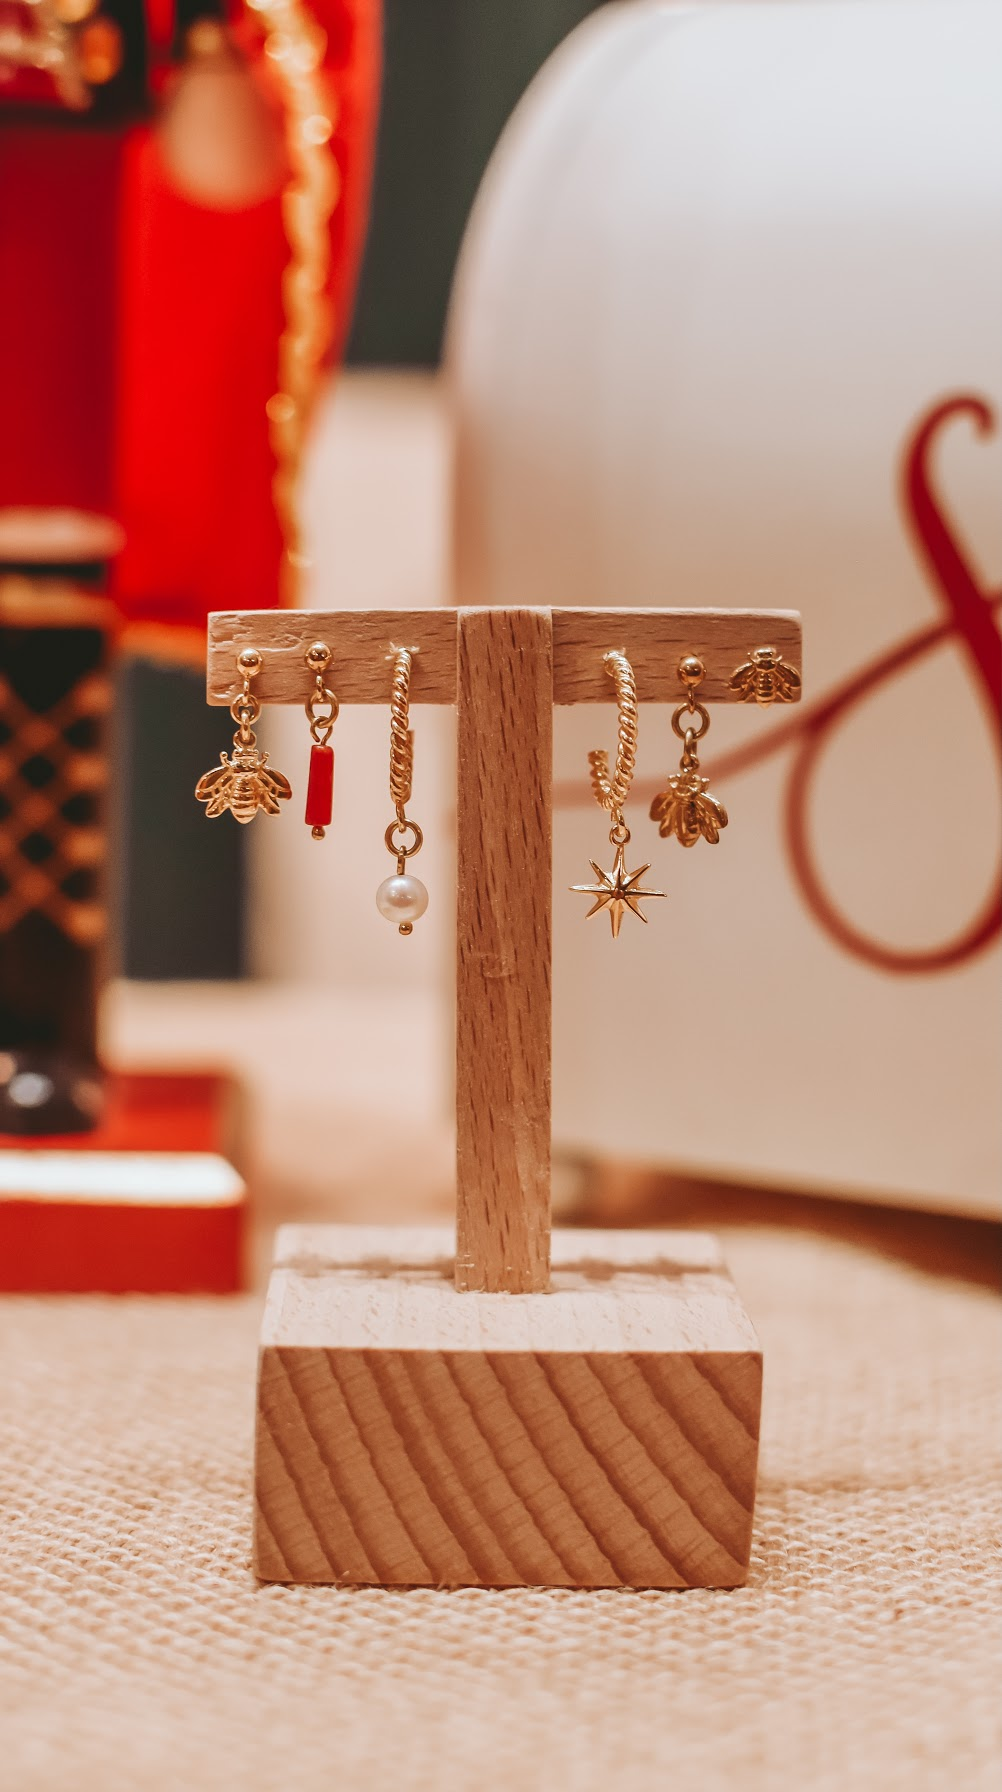 Topla gesta omiljenog domaćeg brenda nakita koja nas je ostavila bez teksta: Iva Viljevac jewelry